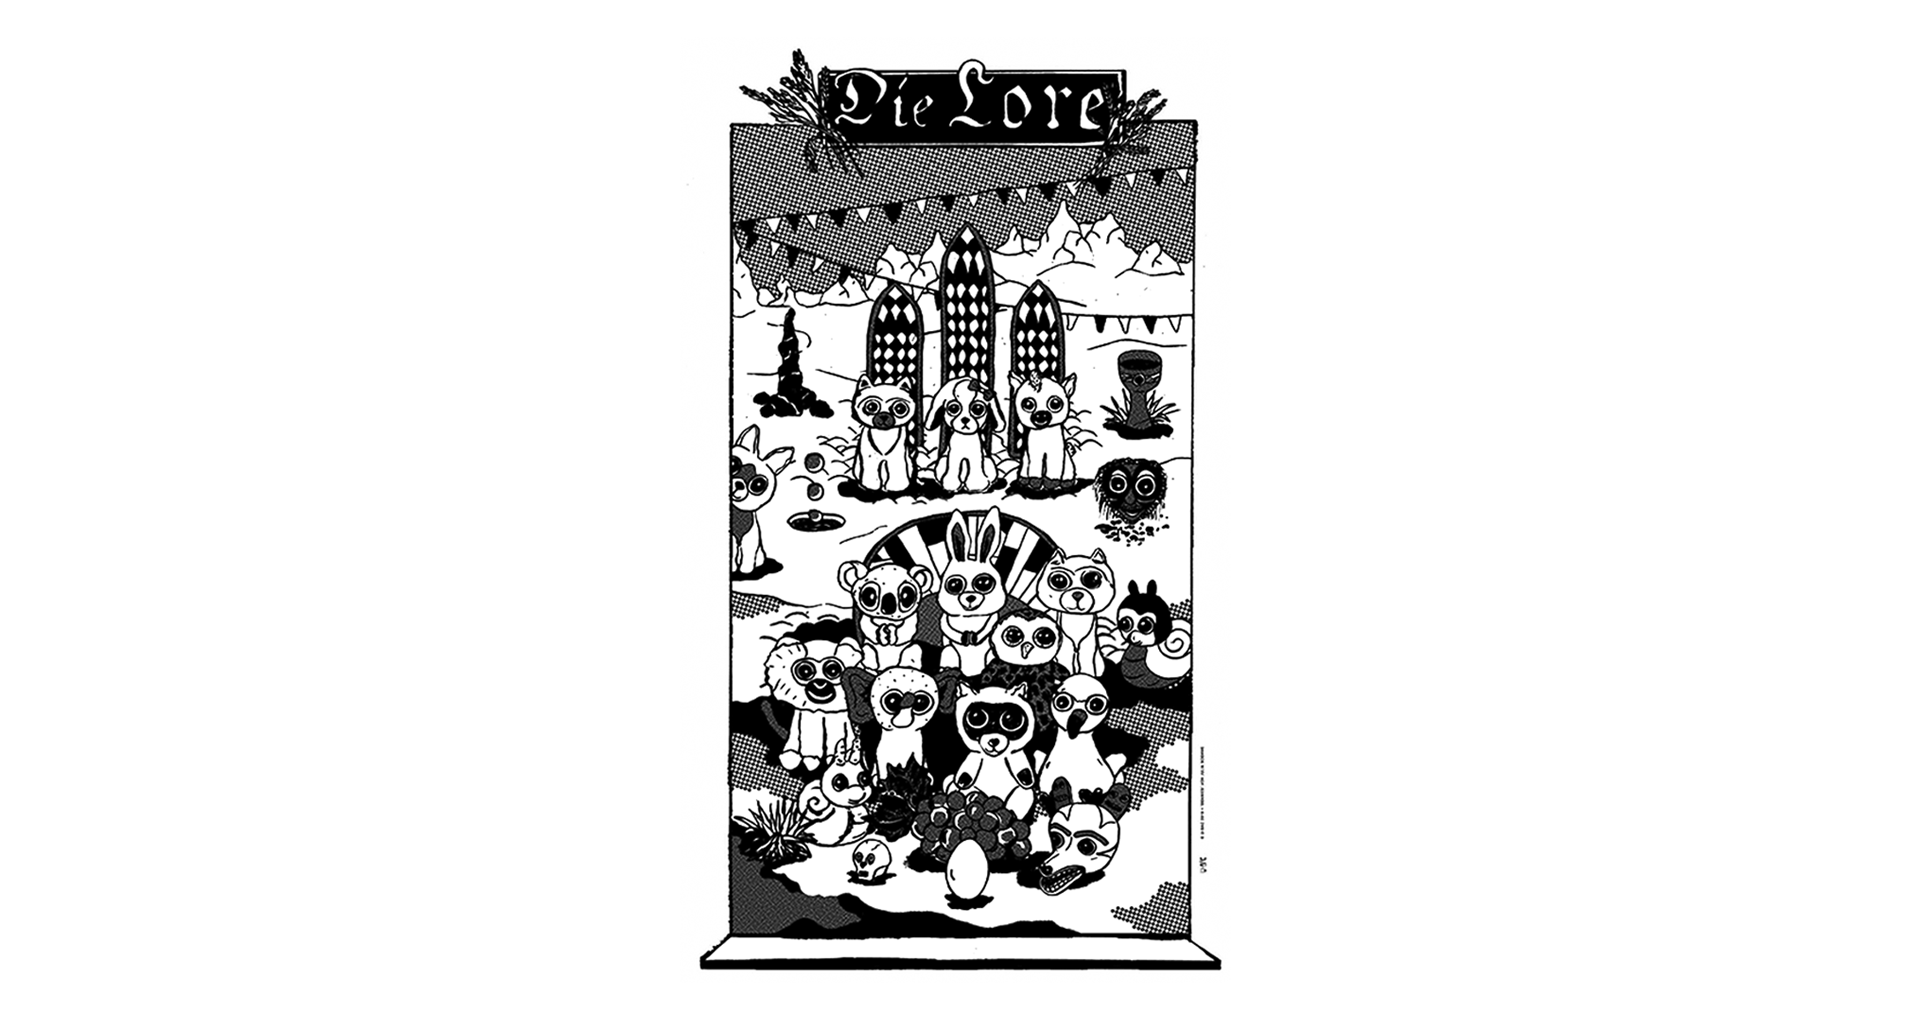 studiogoof studio goof julia boehme juliaboehme illustration gigposter concert poster music poster silkscreen risography Alex Cameron LeVent Ryskinder Moss Lime Tomorrows Tulips Kristen Gelbart Dives Pigeon Die Lore Molde Dives